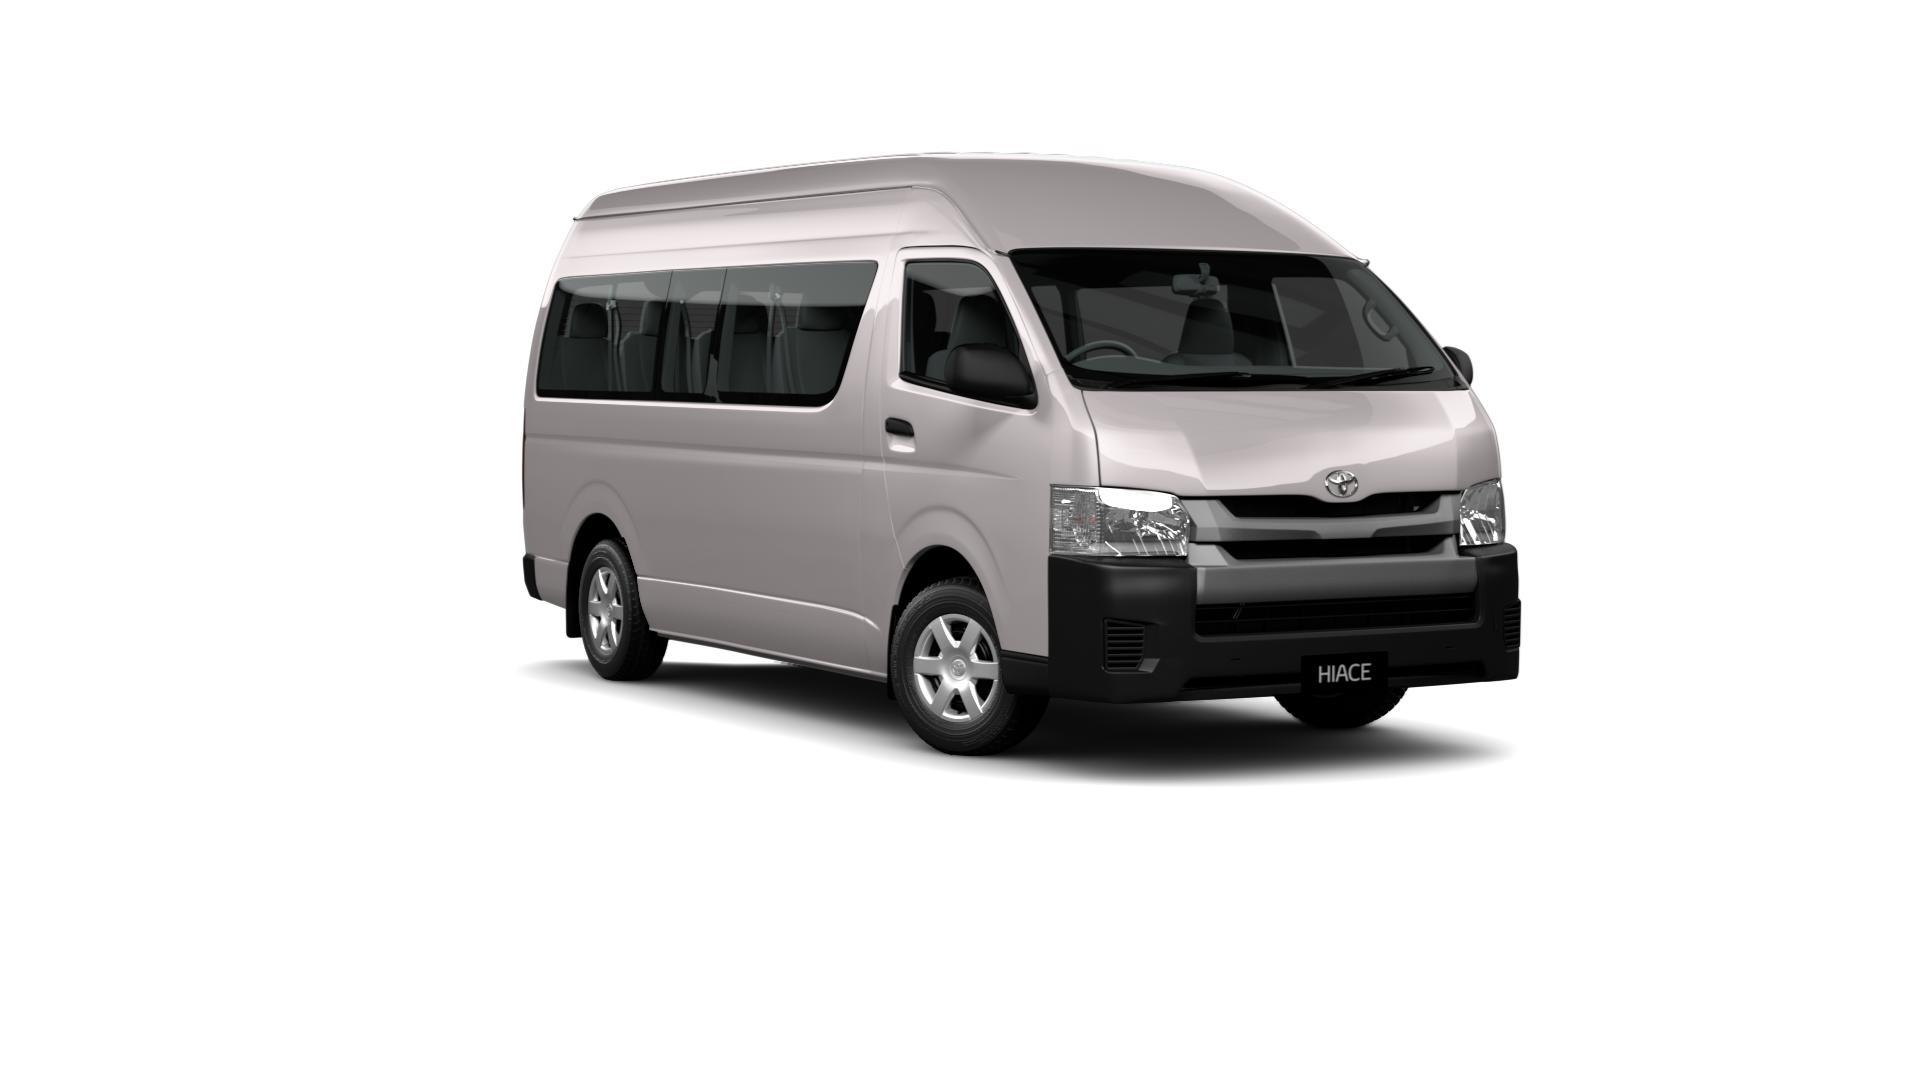 8c21e93208 Toyota HiAce SLWB Commuter Bus Diesel 12 Seats